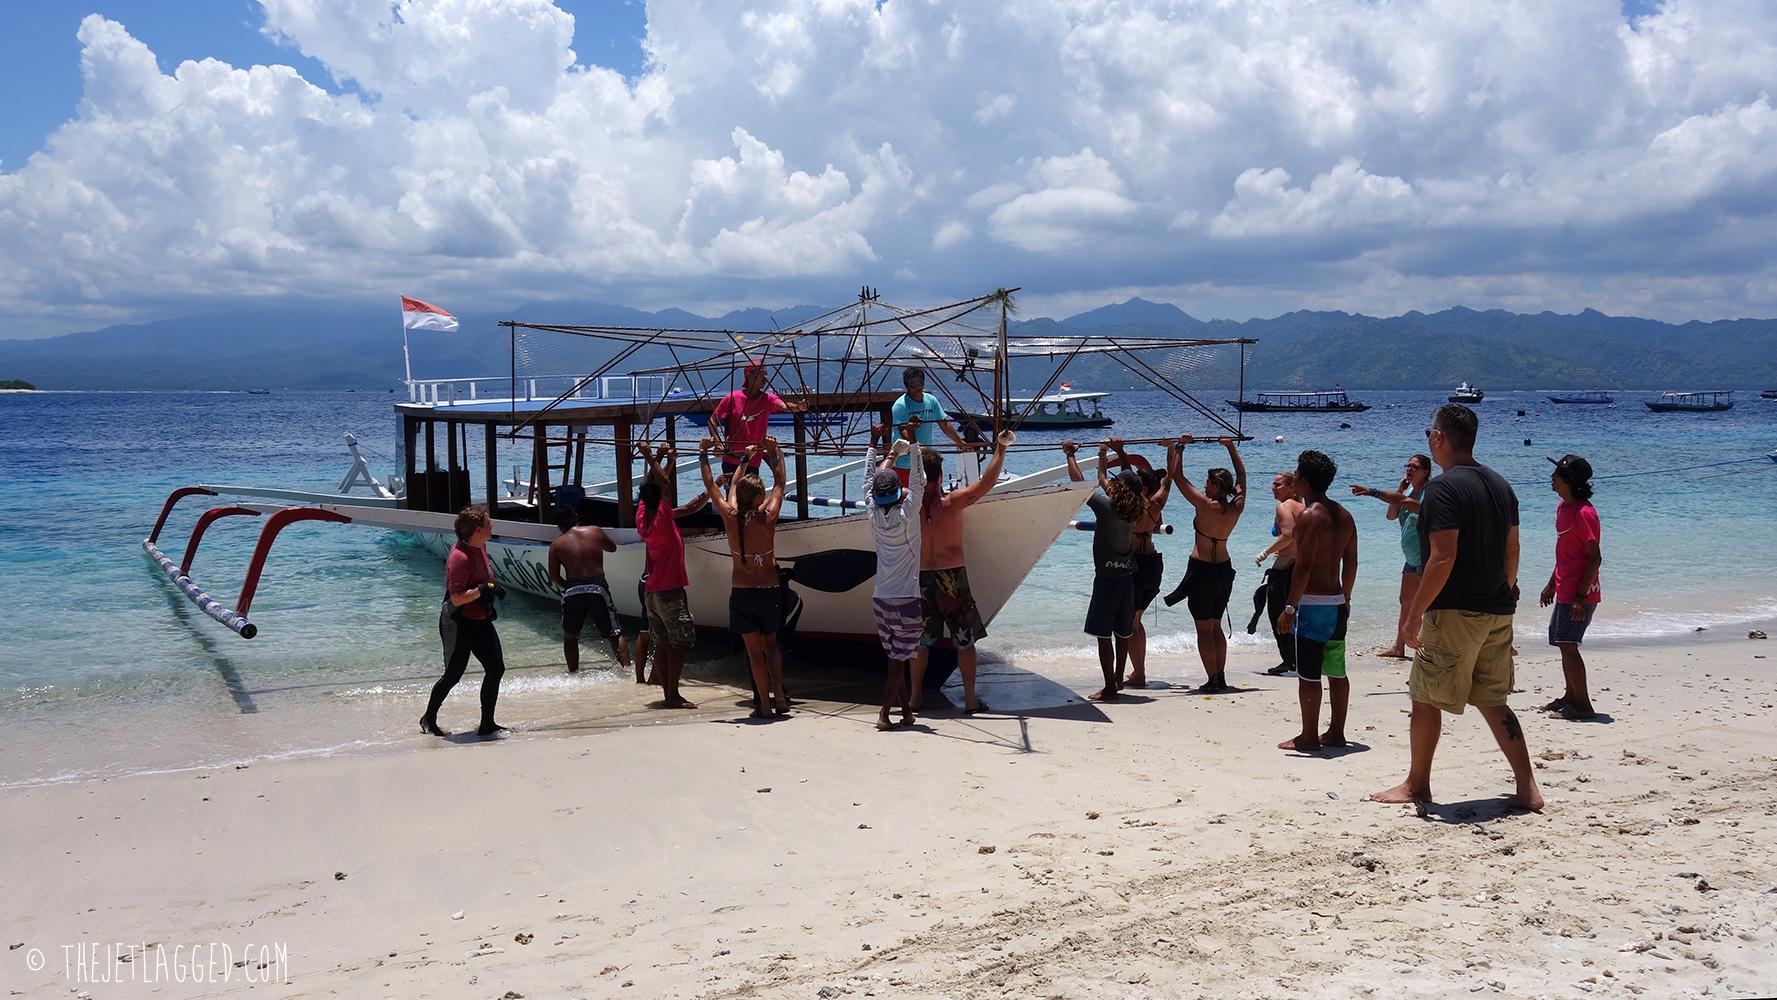 Loading the Bintang Biorock onto the Manta Dive Boat